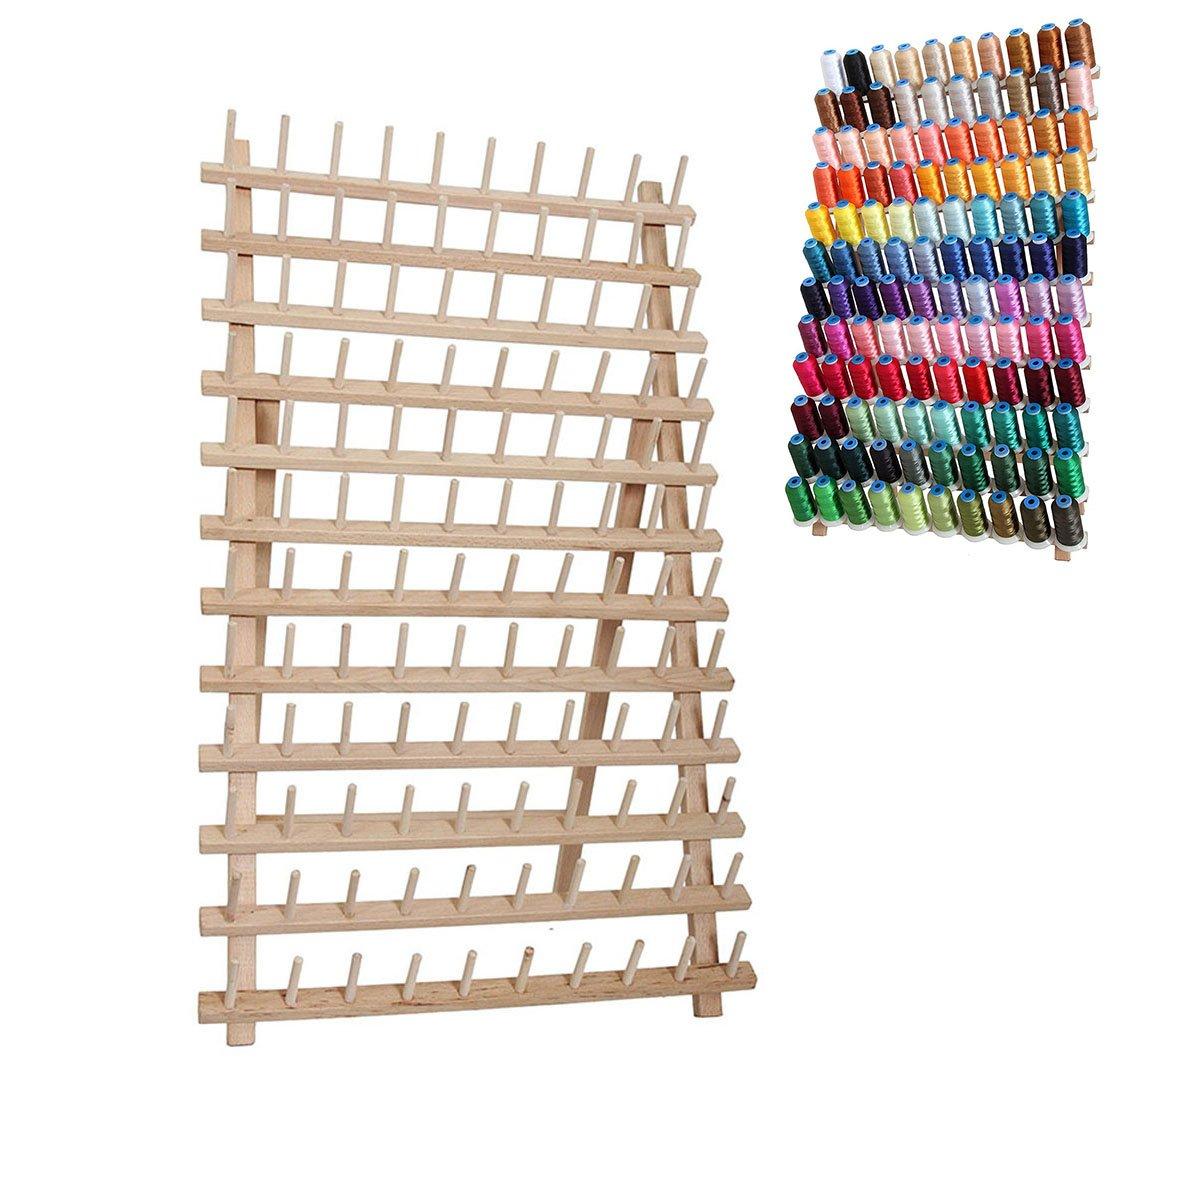 ROSENICE 120 Spool Stand Thread Holder Wooden Rack Thread Organizer Foldable Cone by ROSENICE